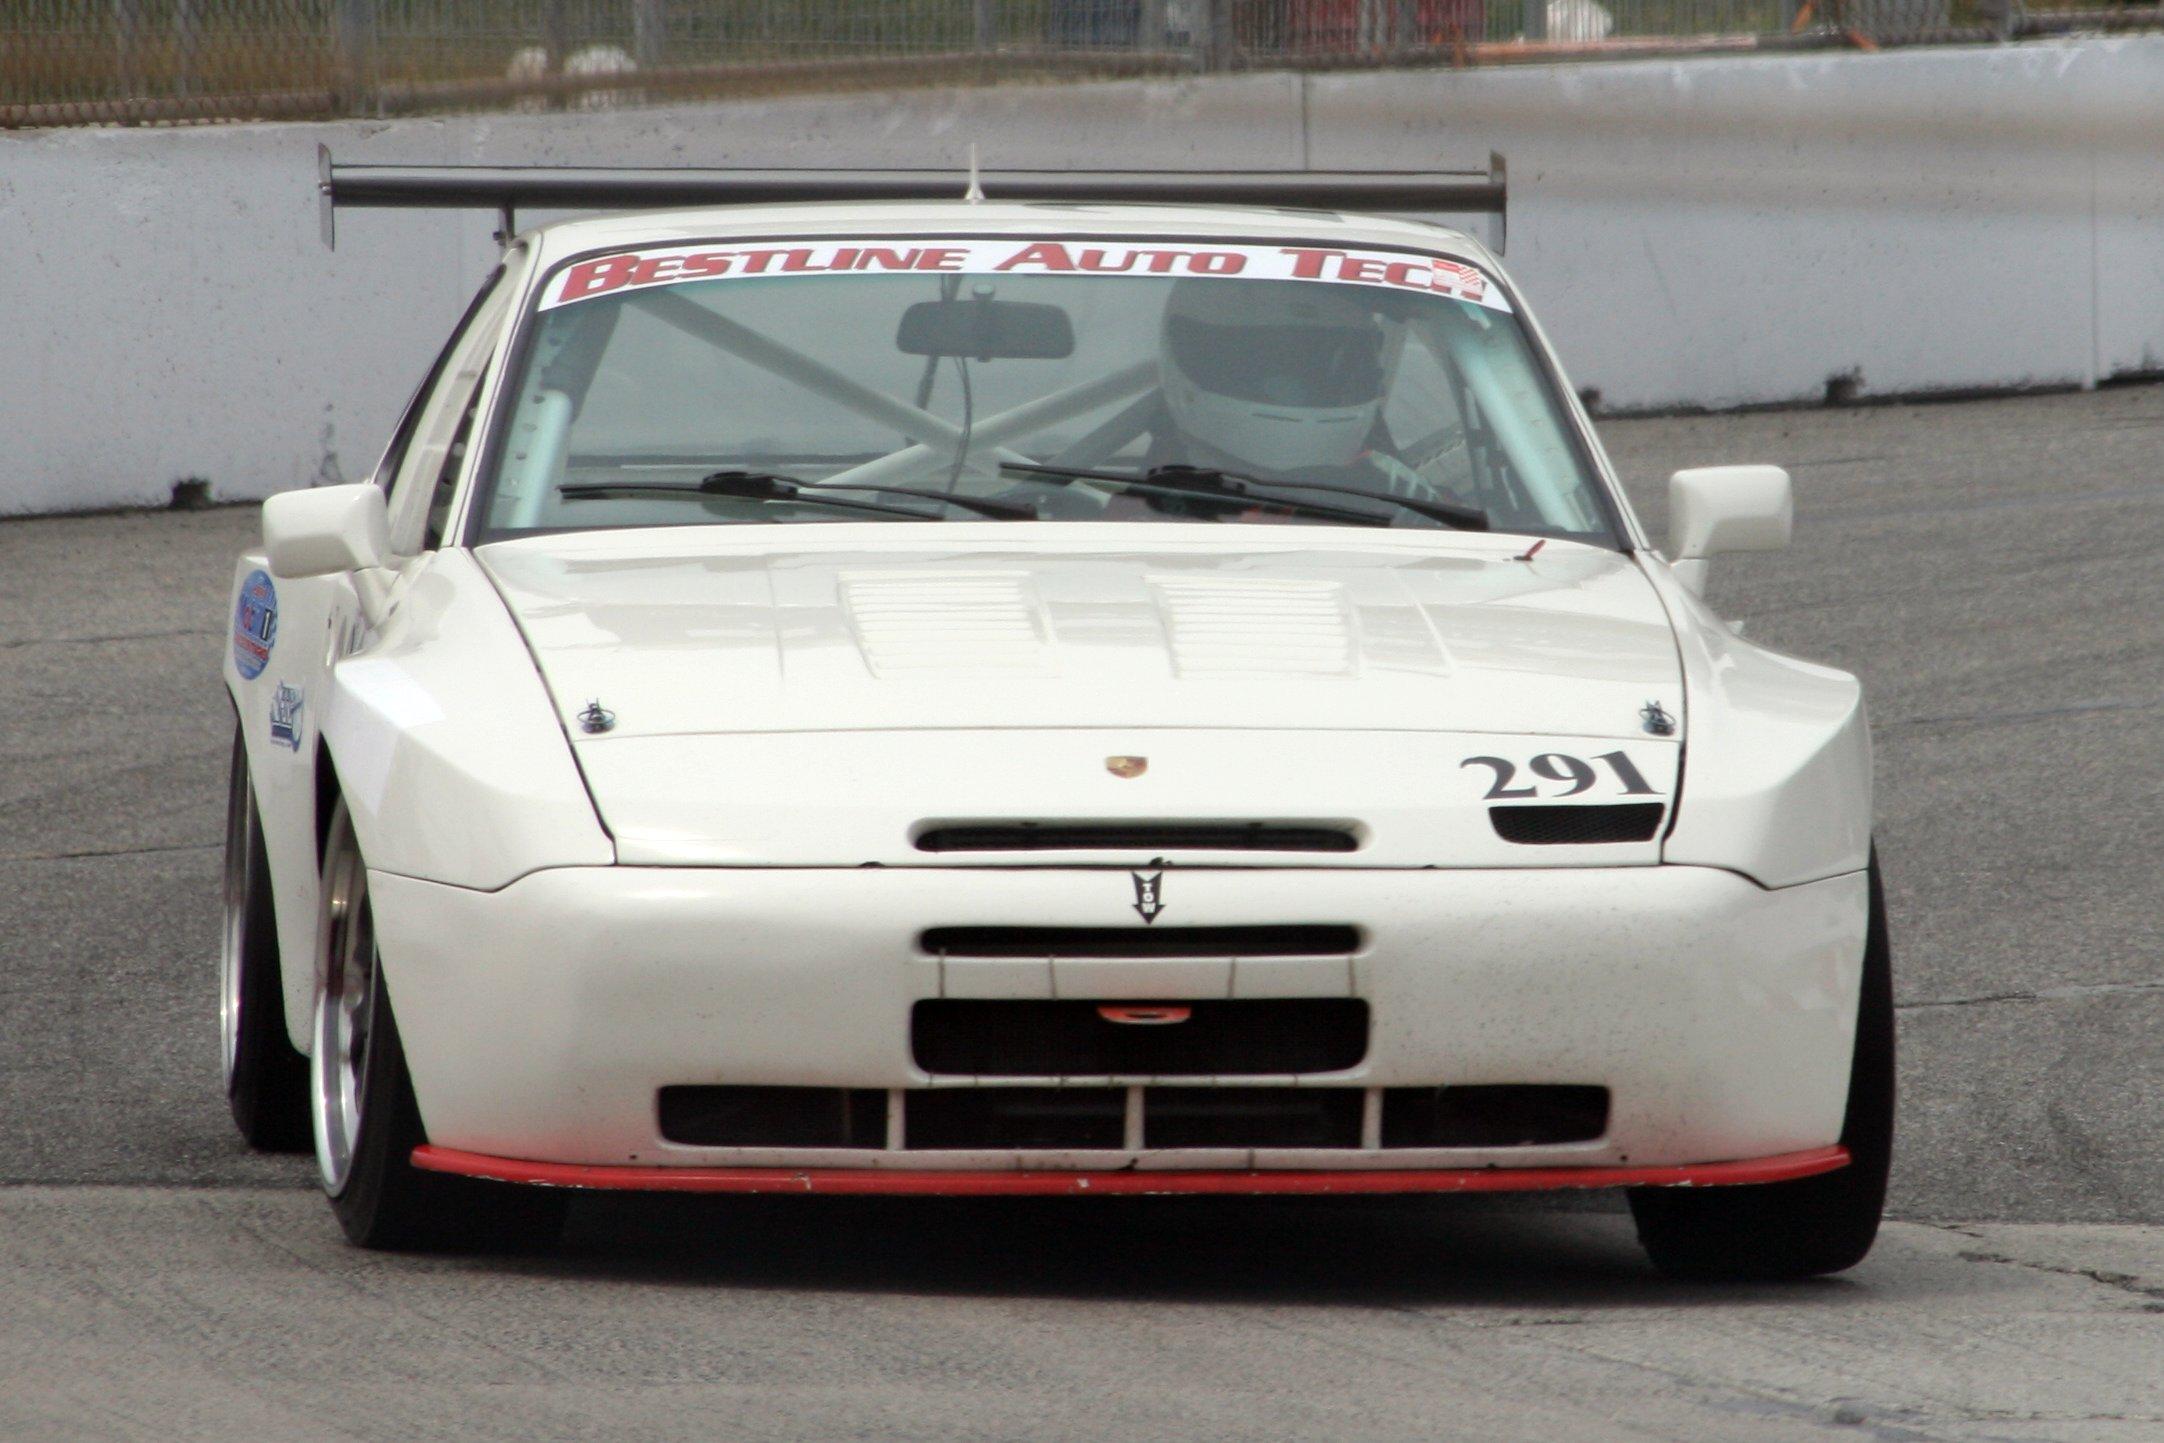 1985 Porsche 944 Turbo Boldride.com - Pictures, Wallpapers